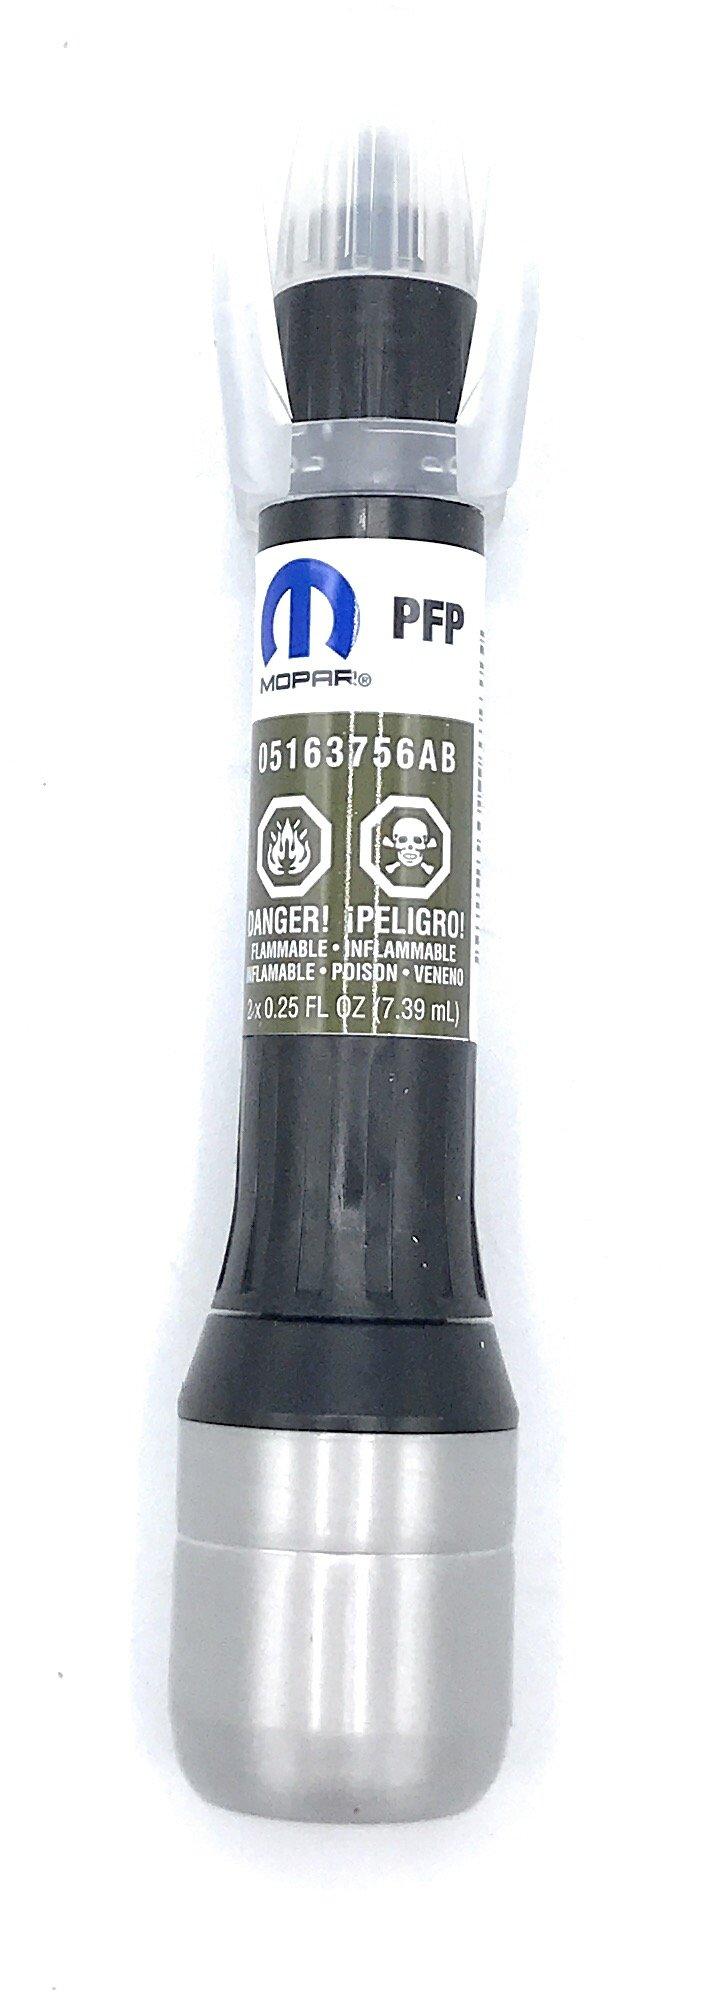 Mopar Olive Green Touch Up Paint - 5163756AB